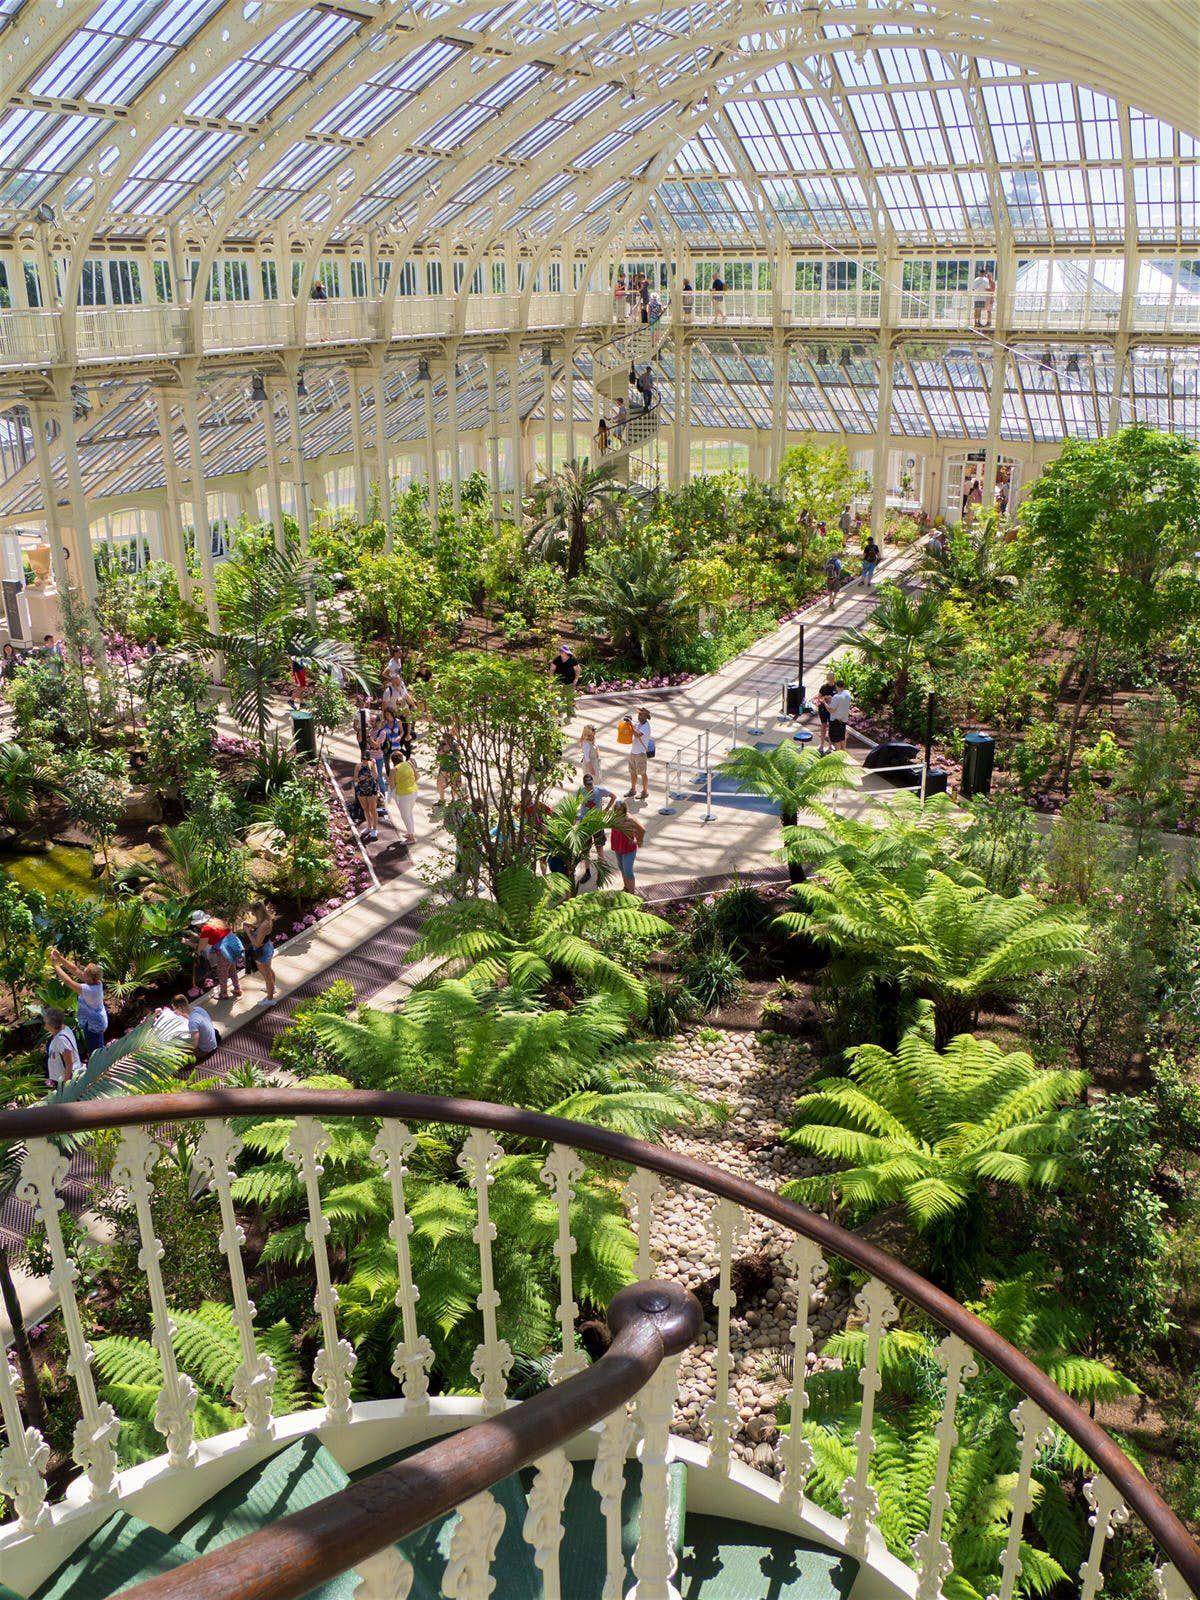 0f89cd448152c2f5abc0bccf9608e5c4 - Best Places To Stay Near Kew Gardens